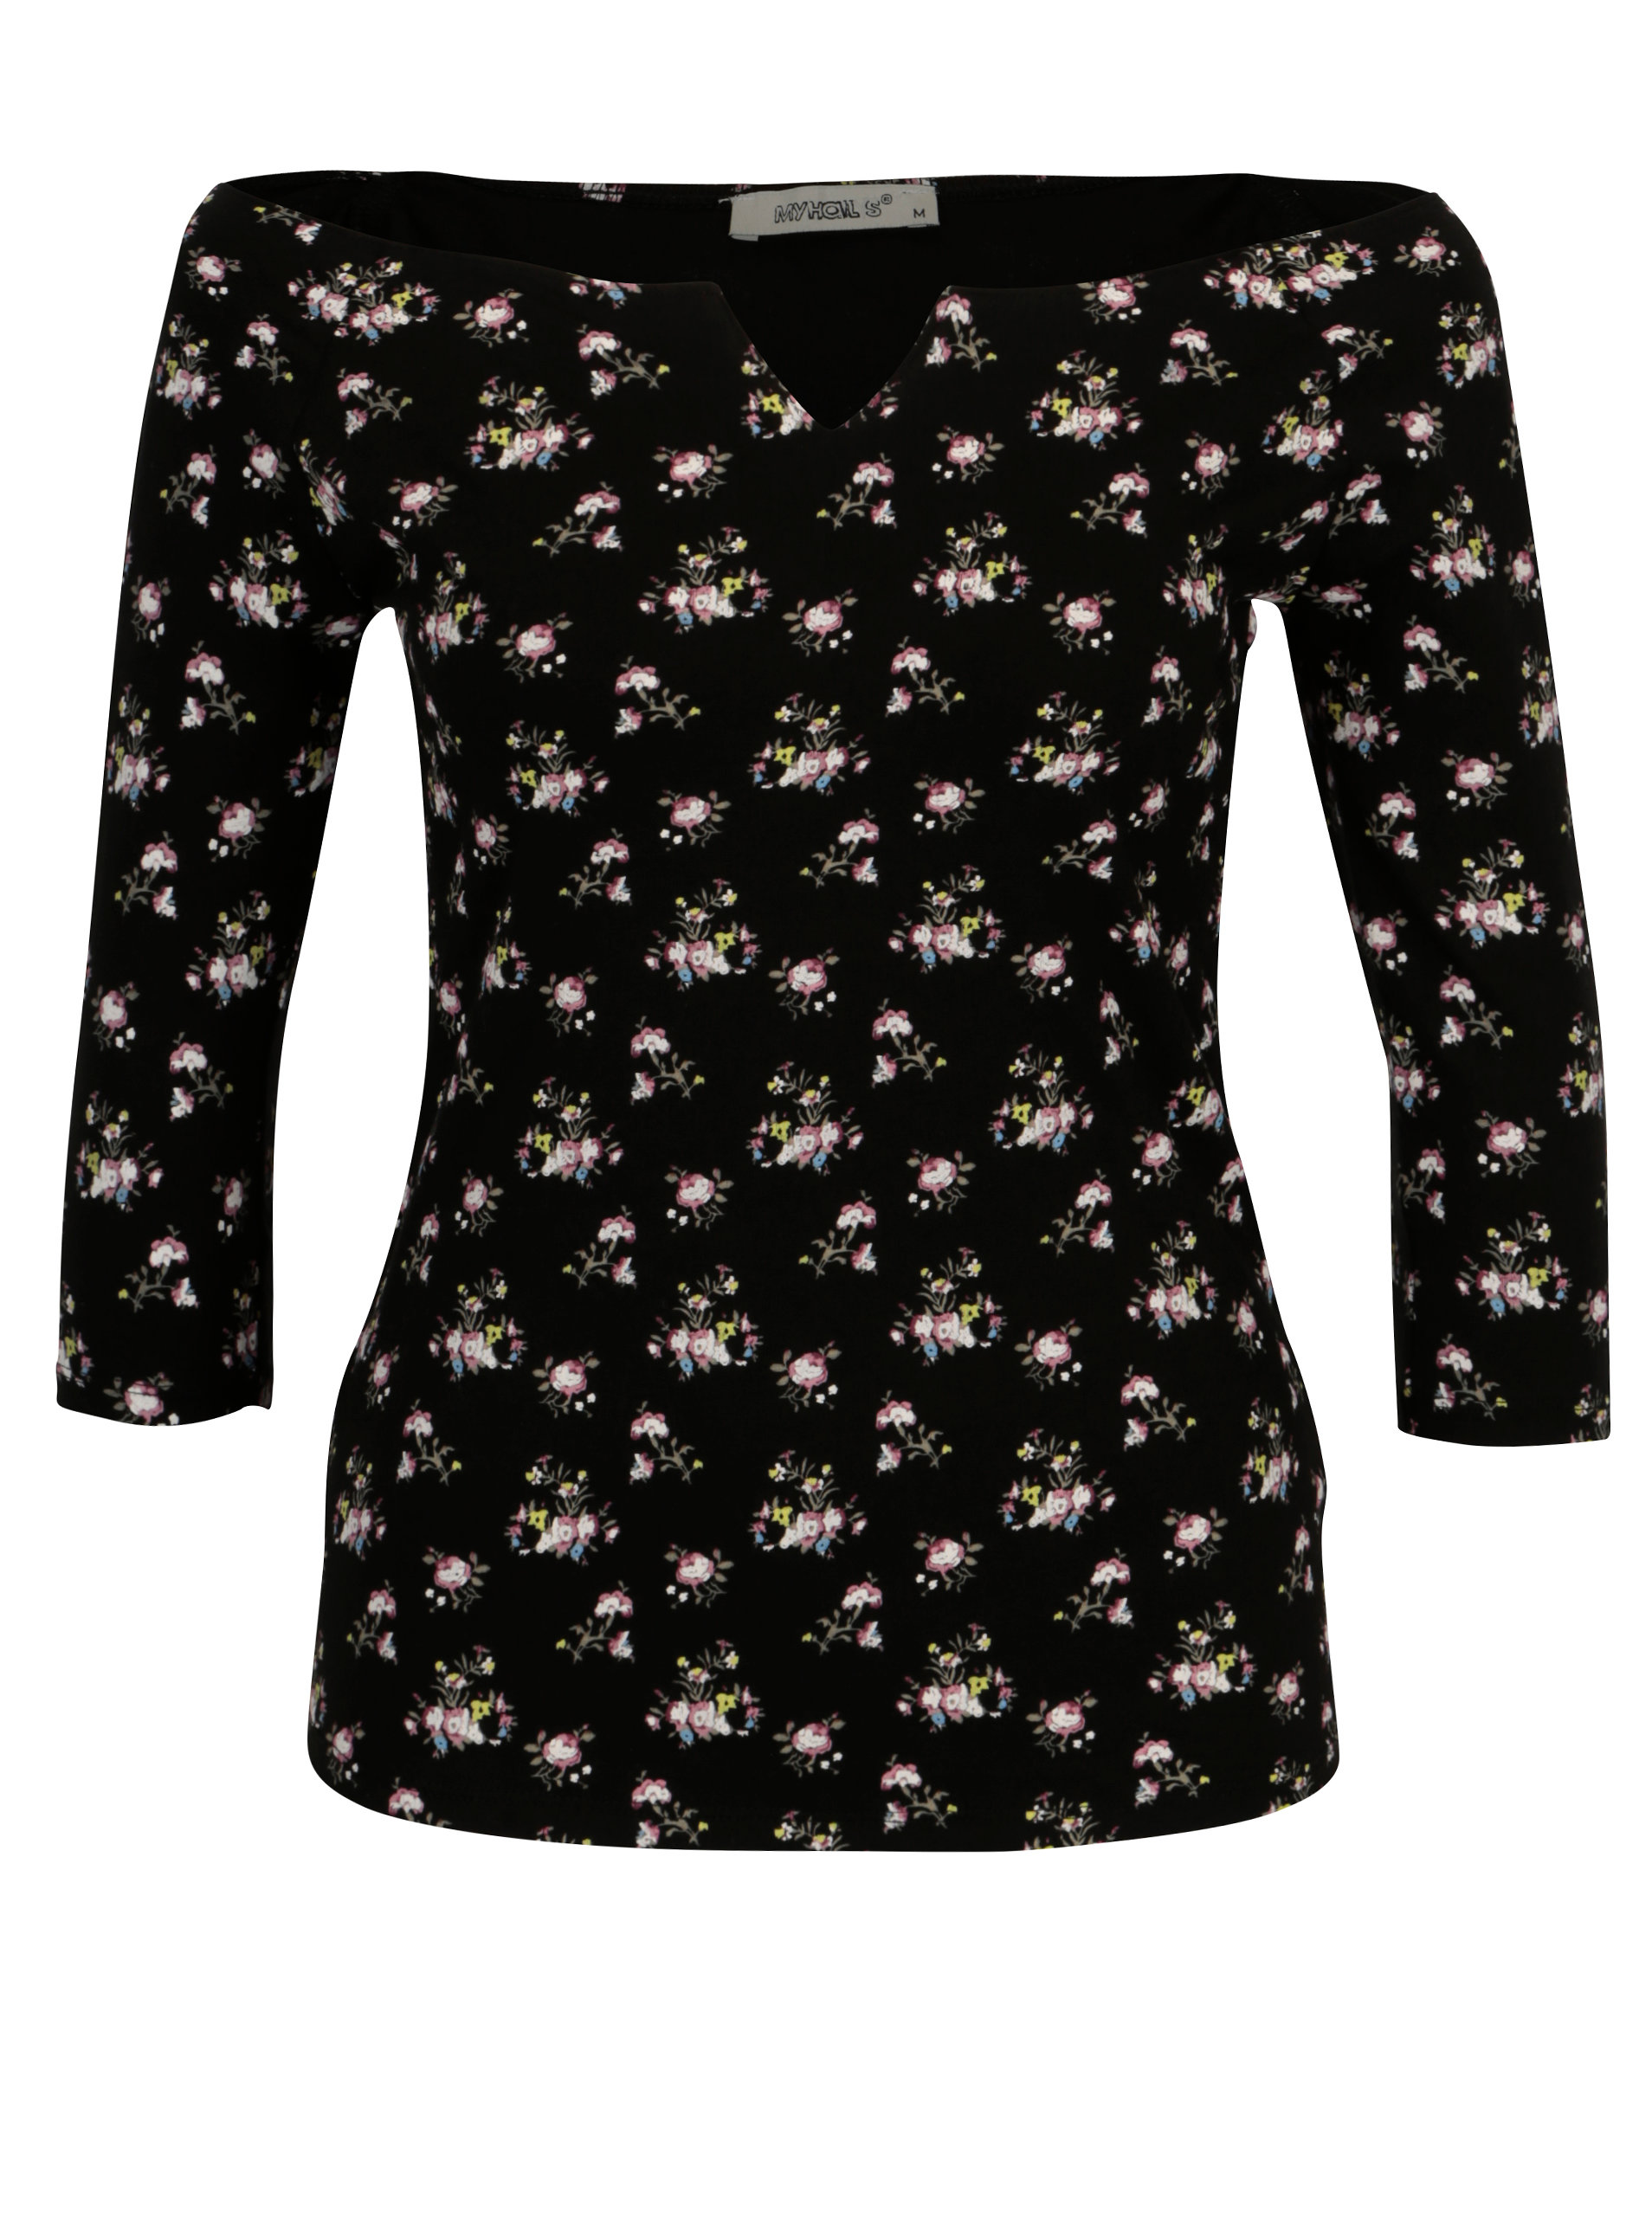 Černý květovaný top s holými rameny Haily s Racheline f71dd9444a